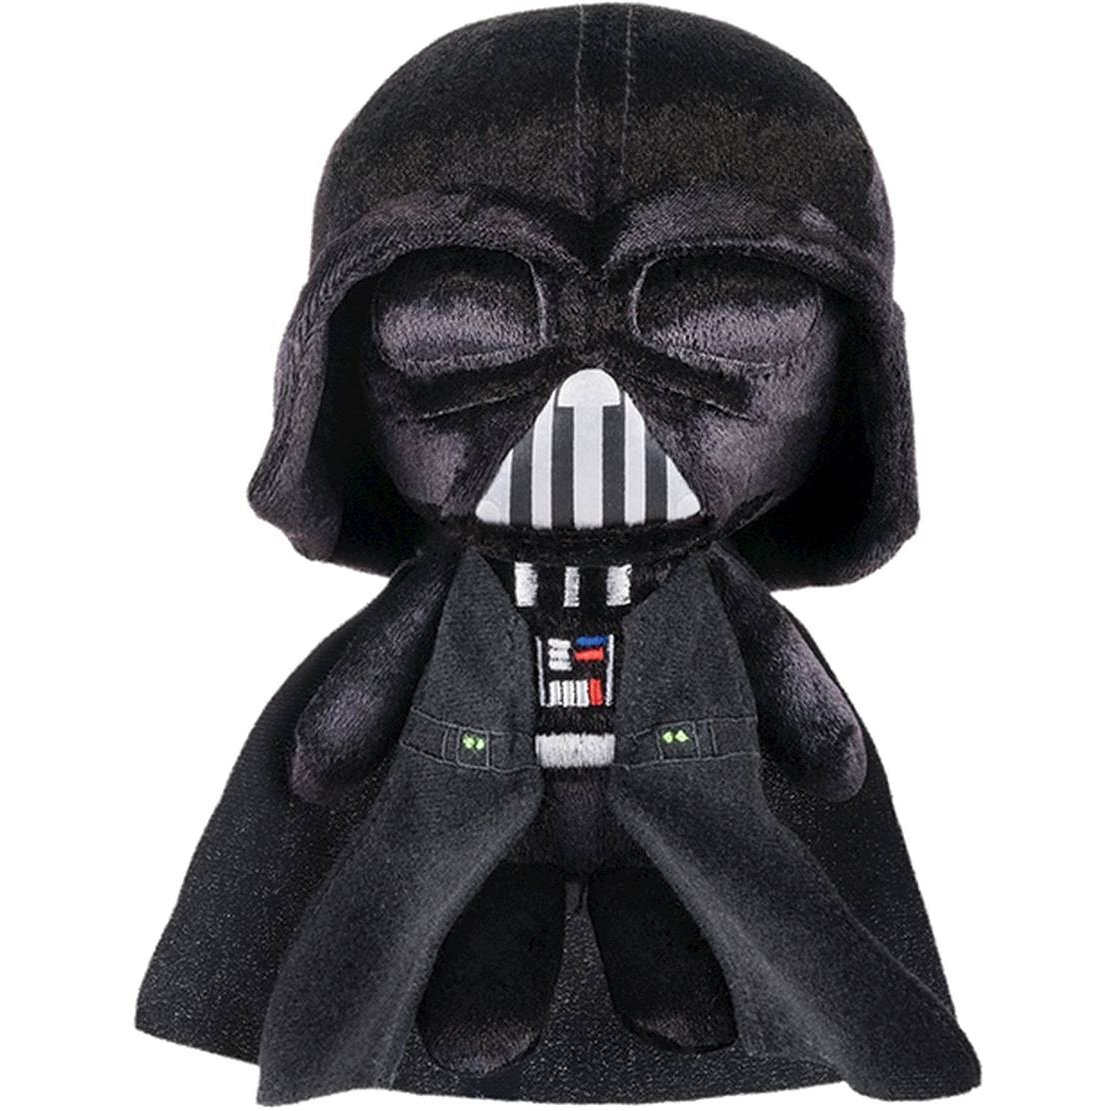 1 Free Official Star Wars Trading Card Bundle BCC9QLR Funko Darth Vader SuperCute Plushies x Star Wars Plush 111096